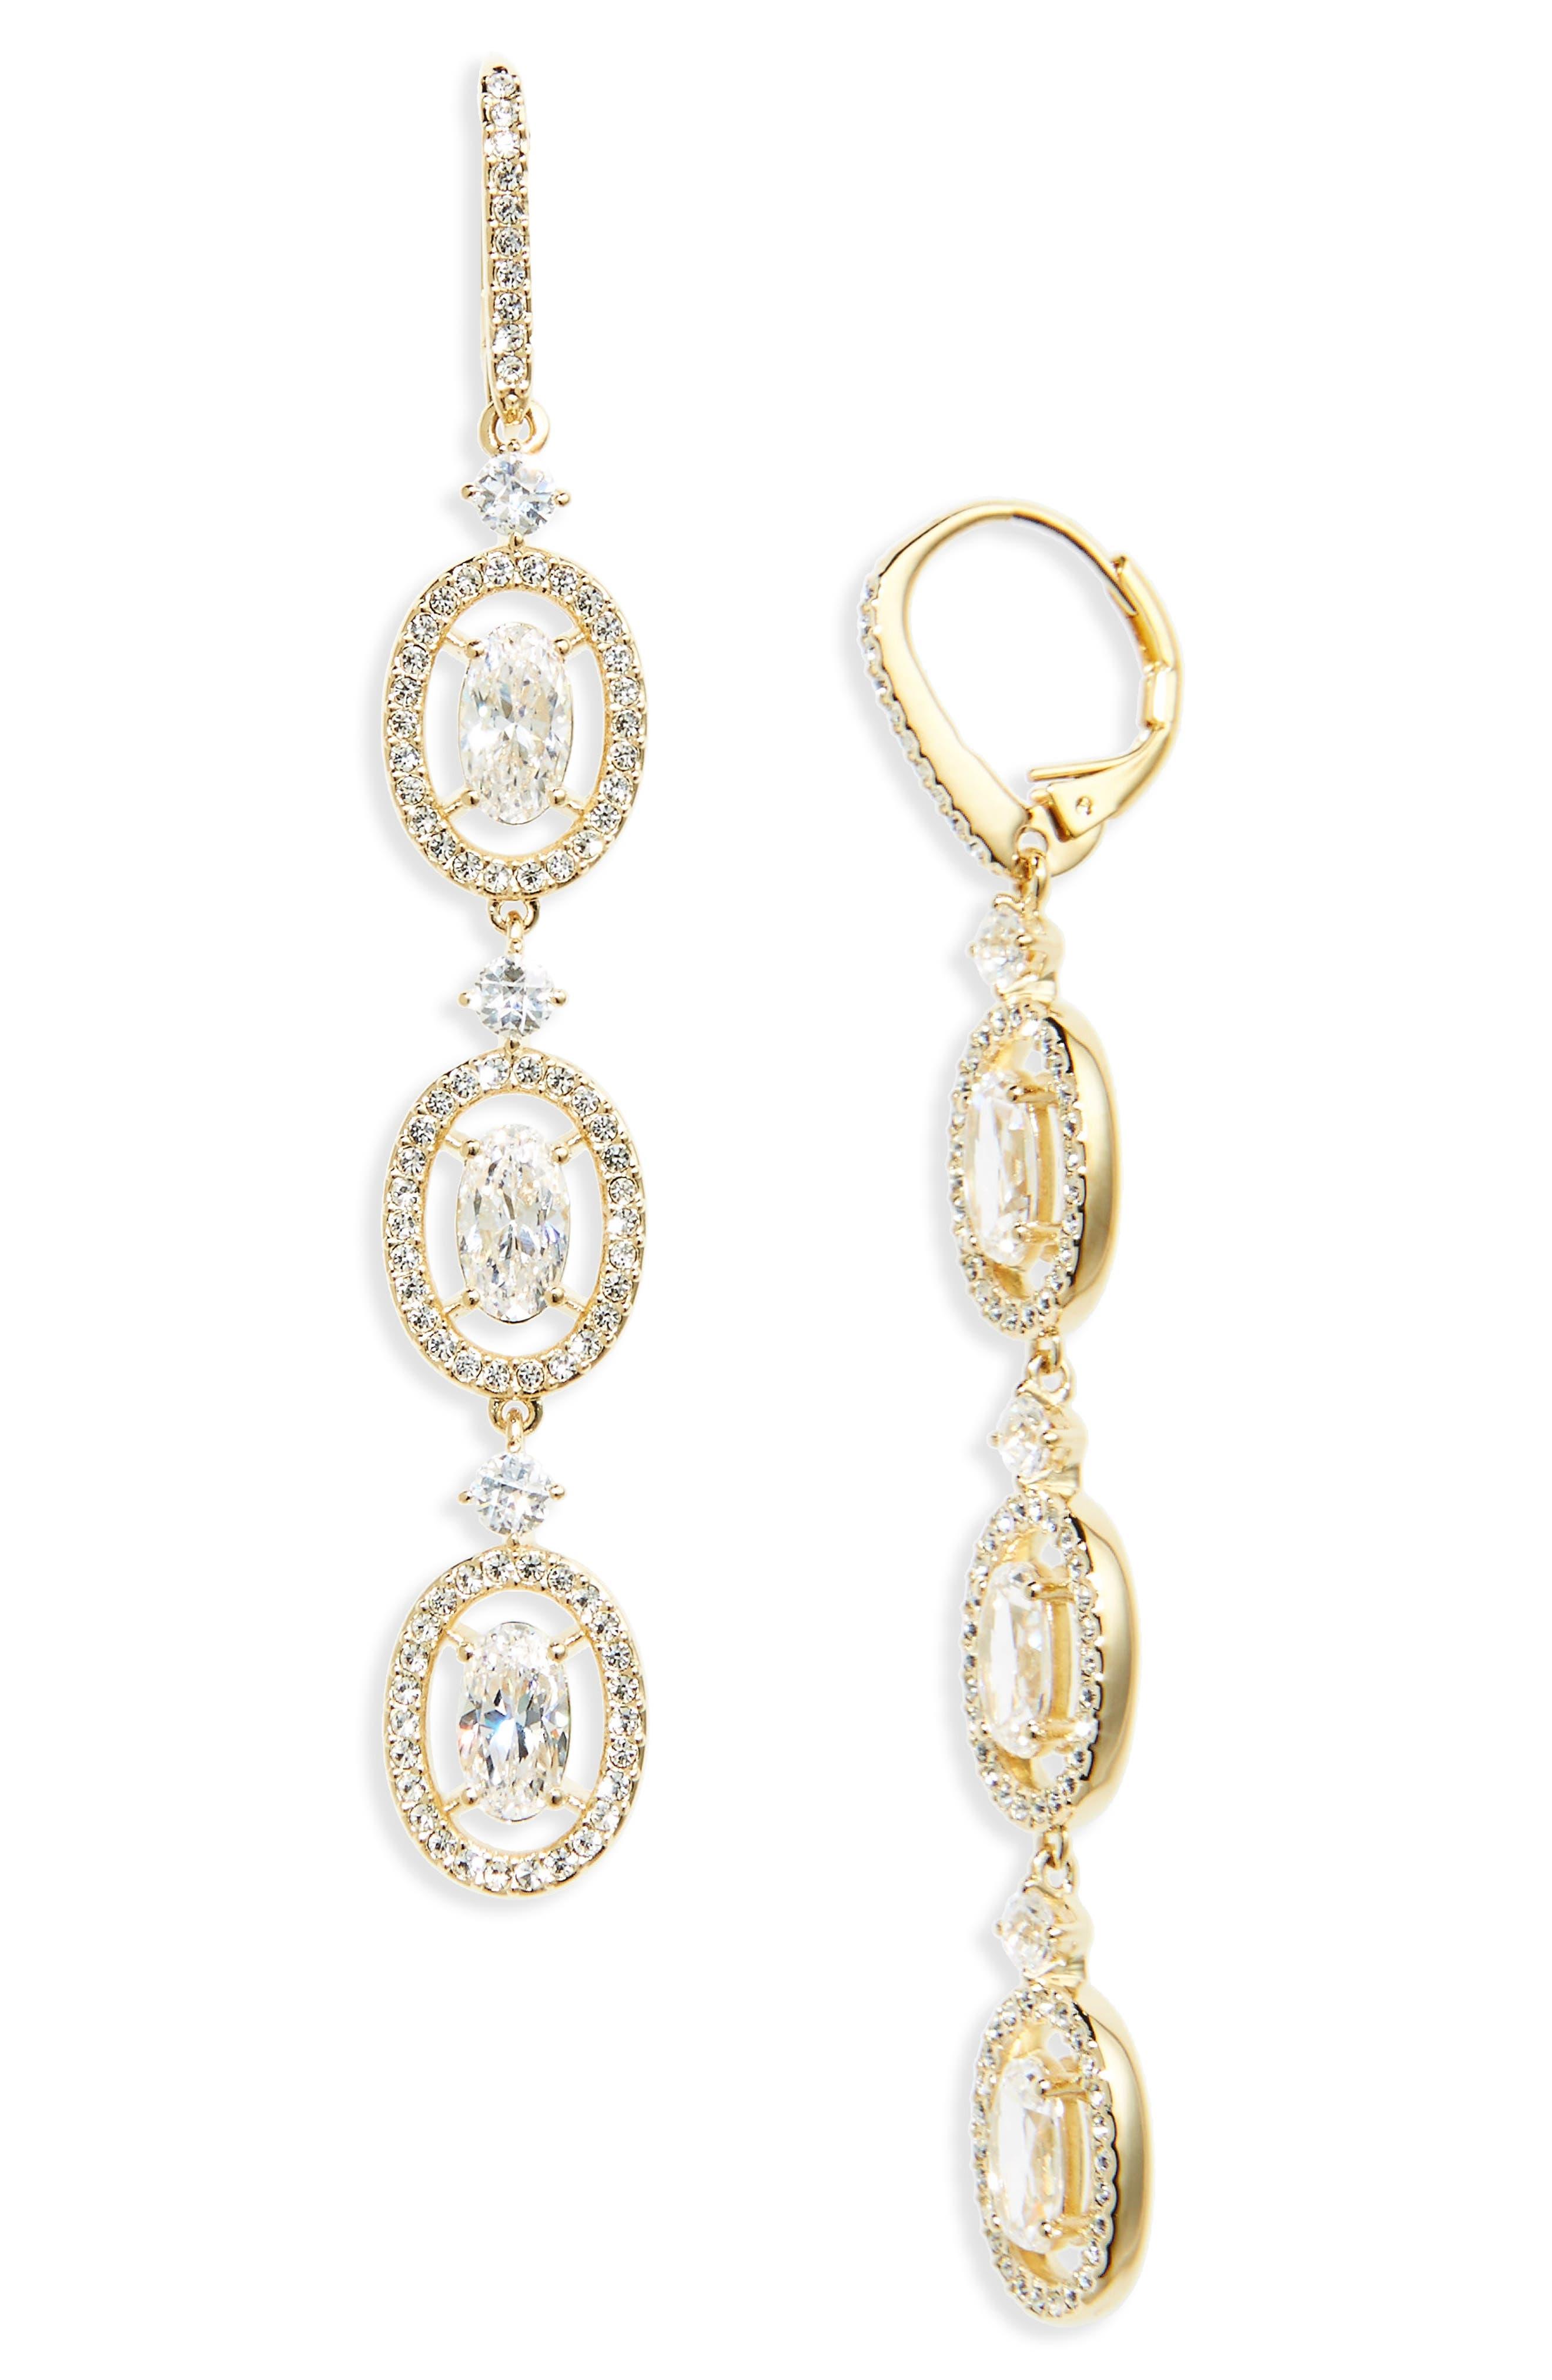 Oval Halo Drop Earrings,                             Main thumbnail 1, color,                             GOLD